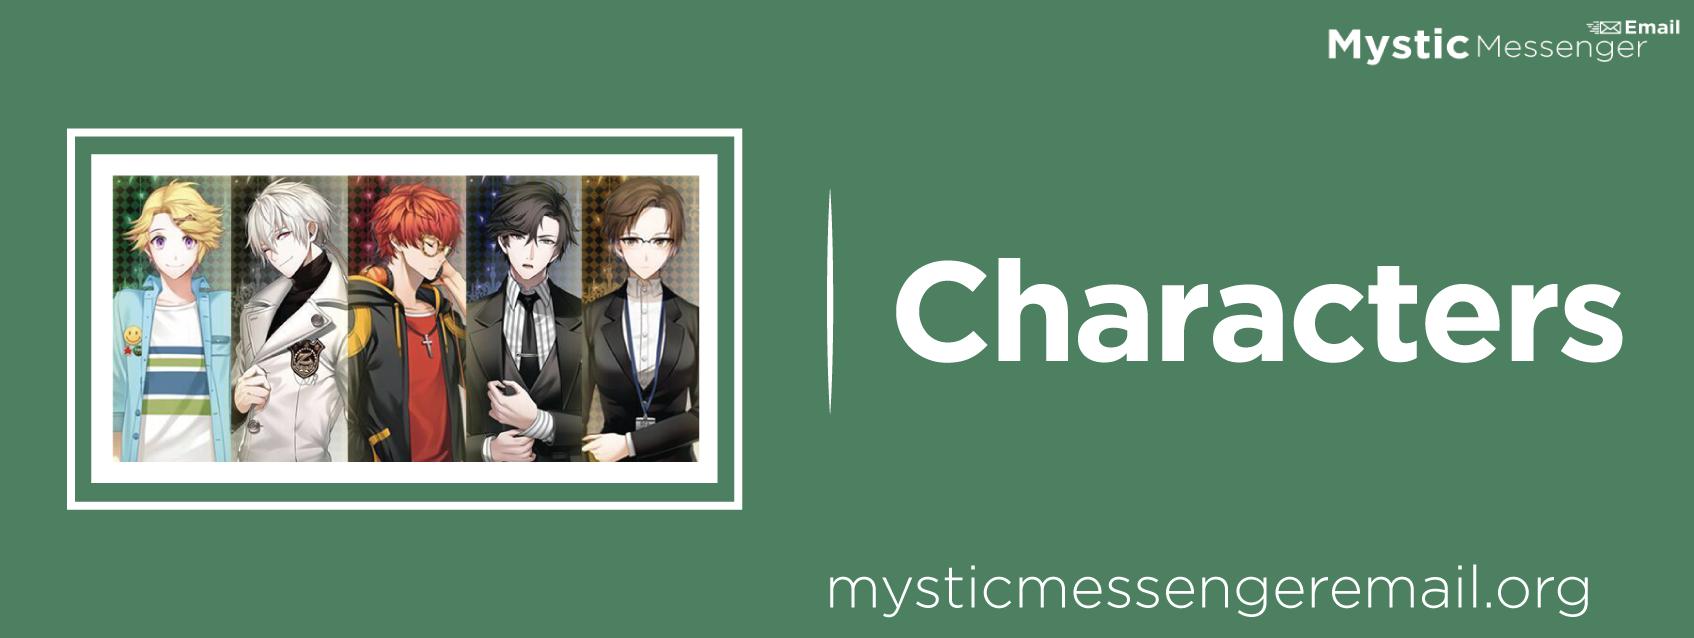 mystic-messenger-characters